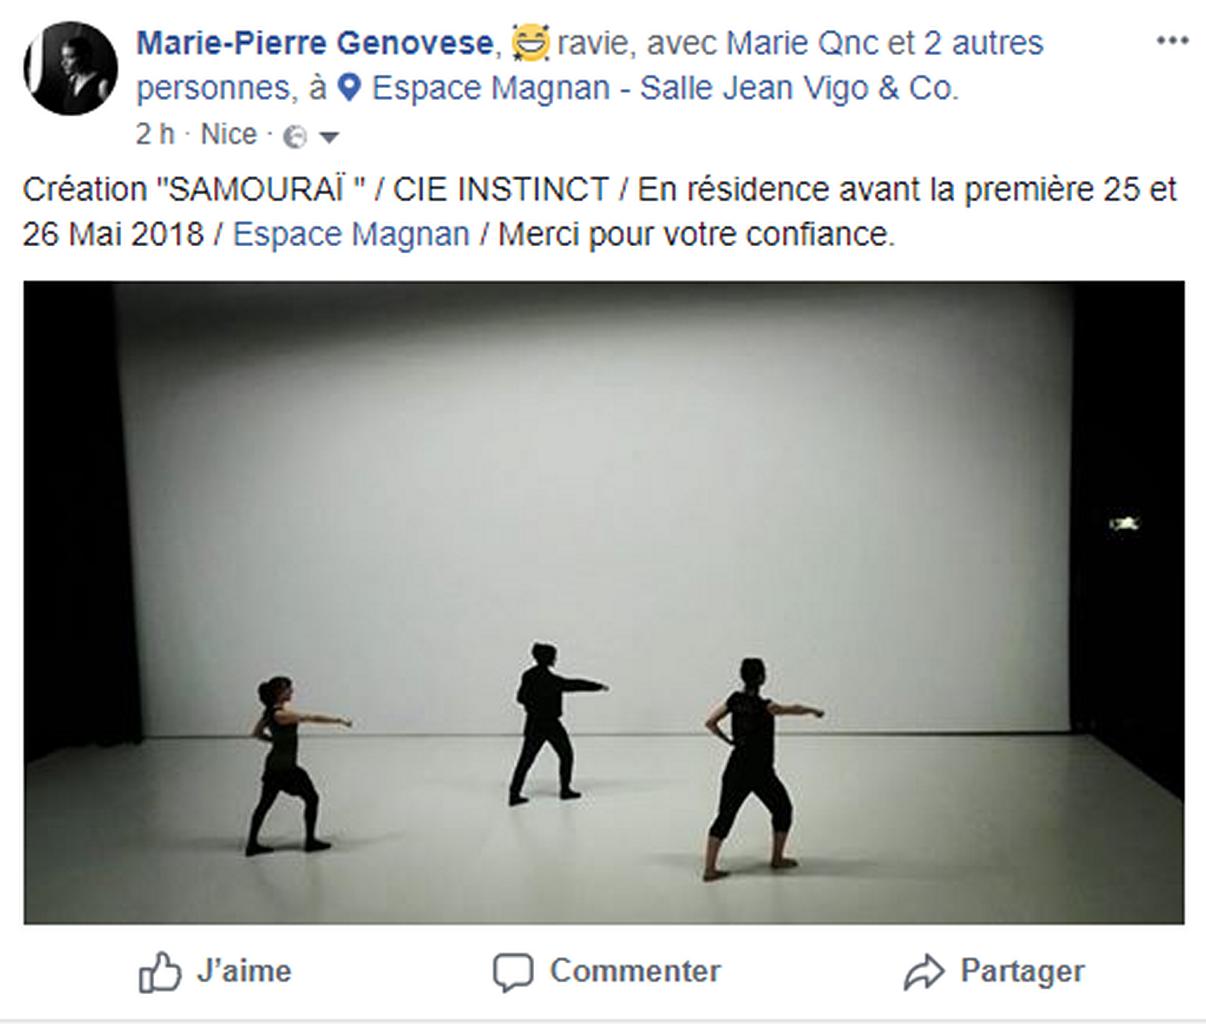 Marie-Pierre Genovese et divers Samouraï